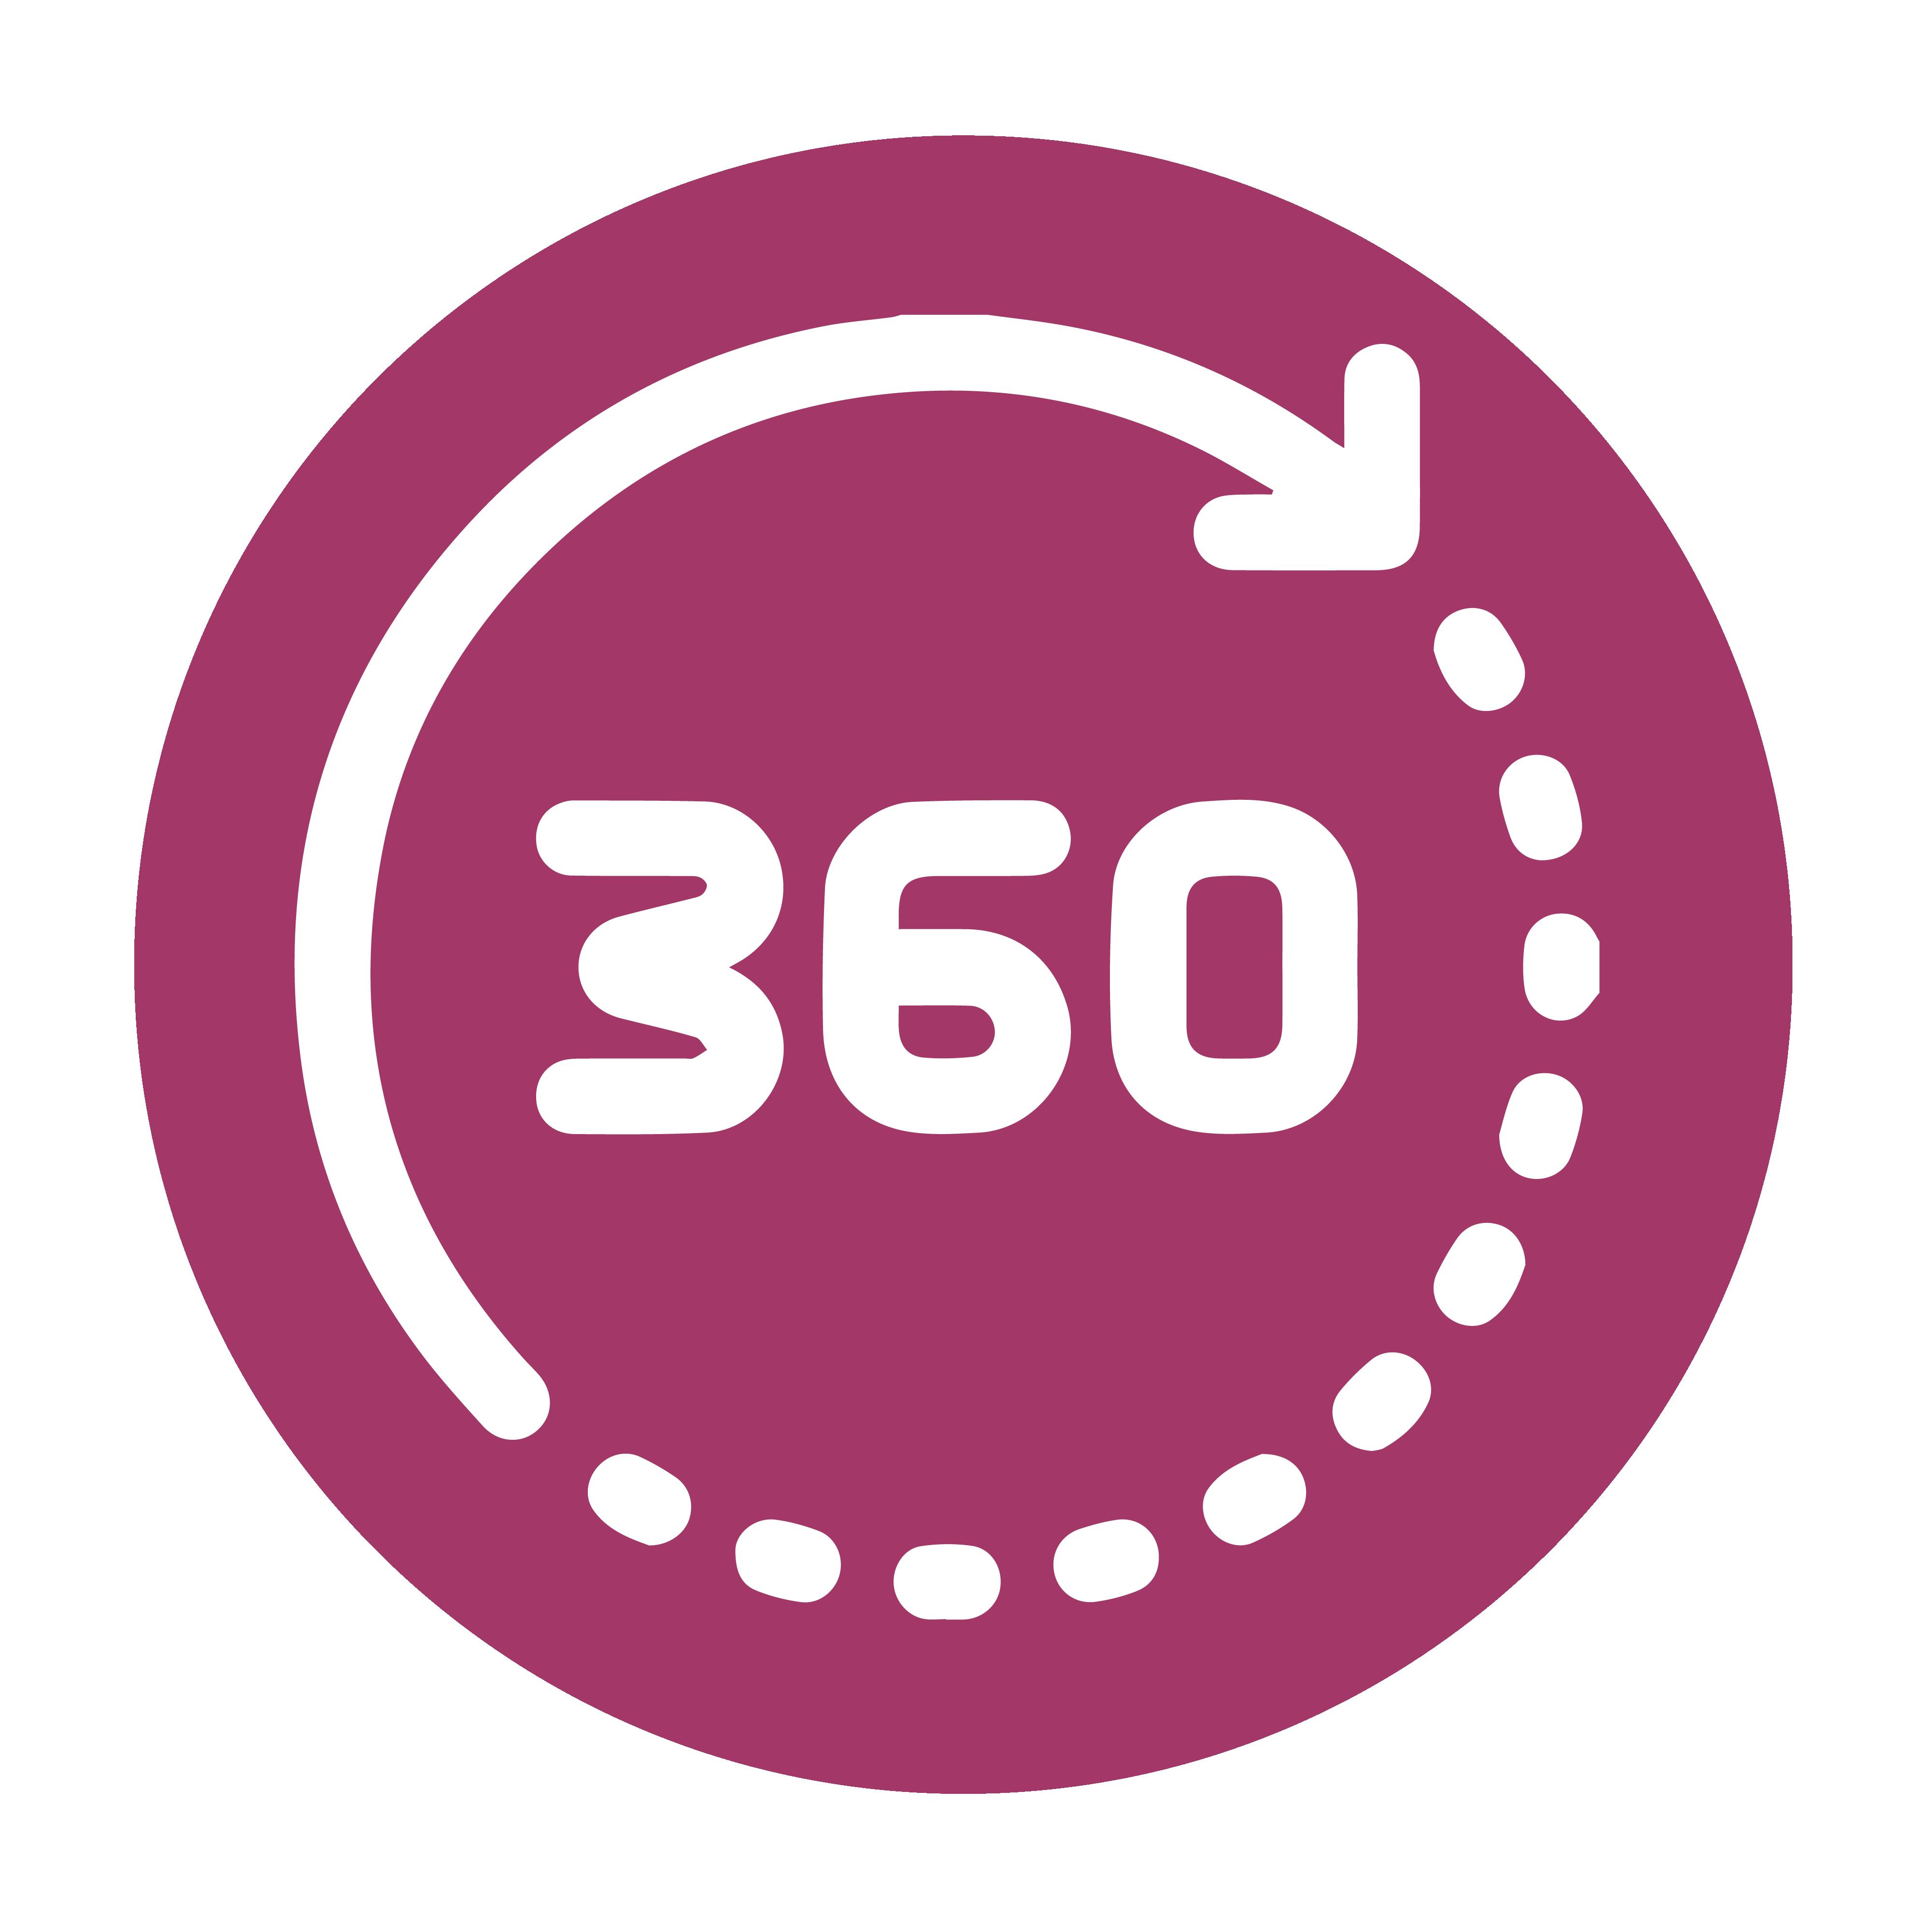 marketing_icons_360_tours